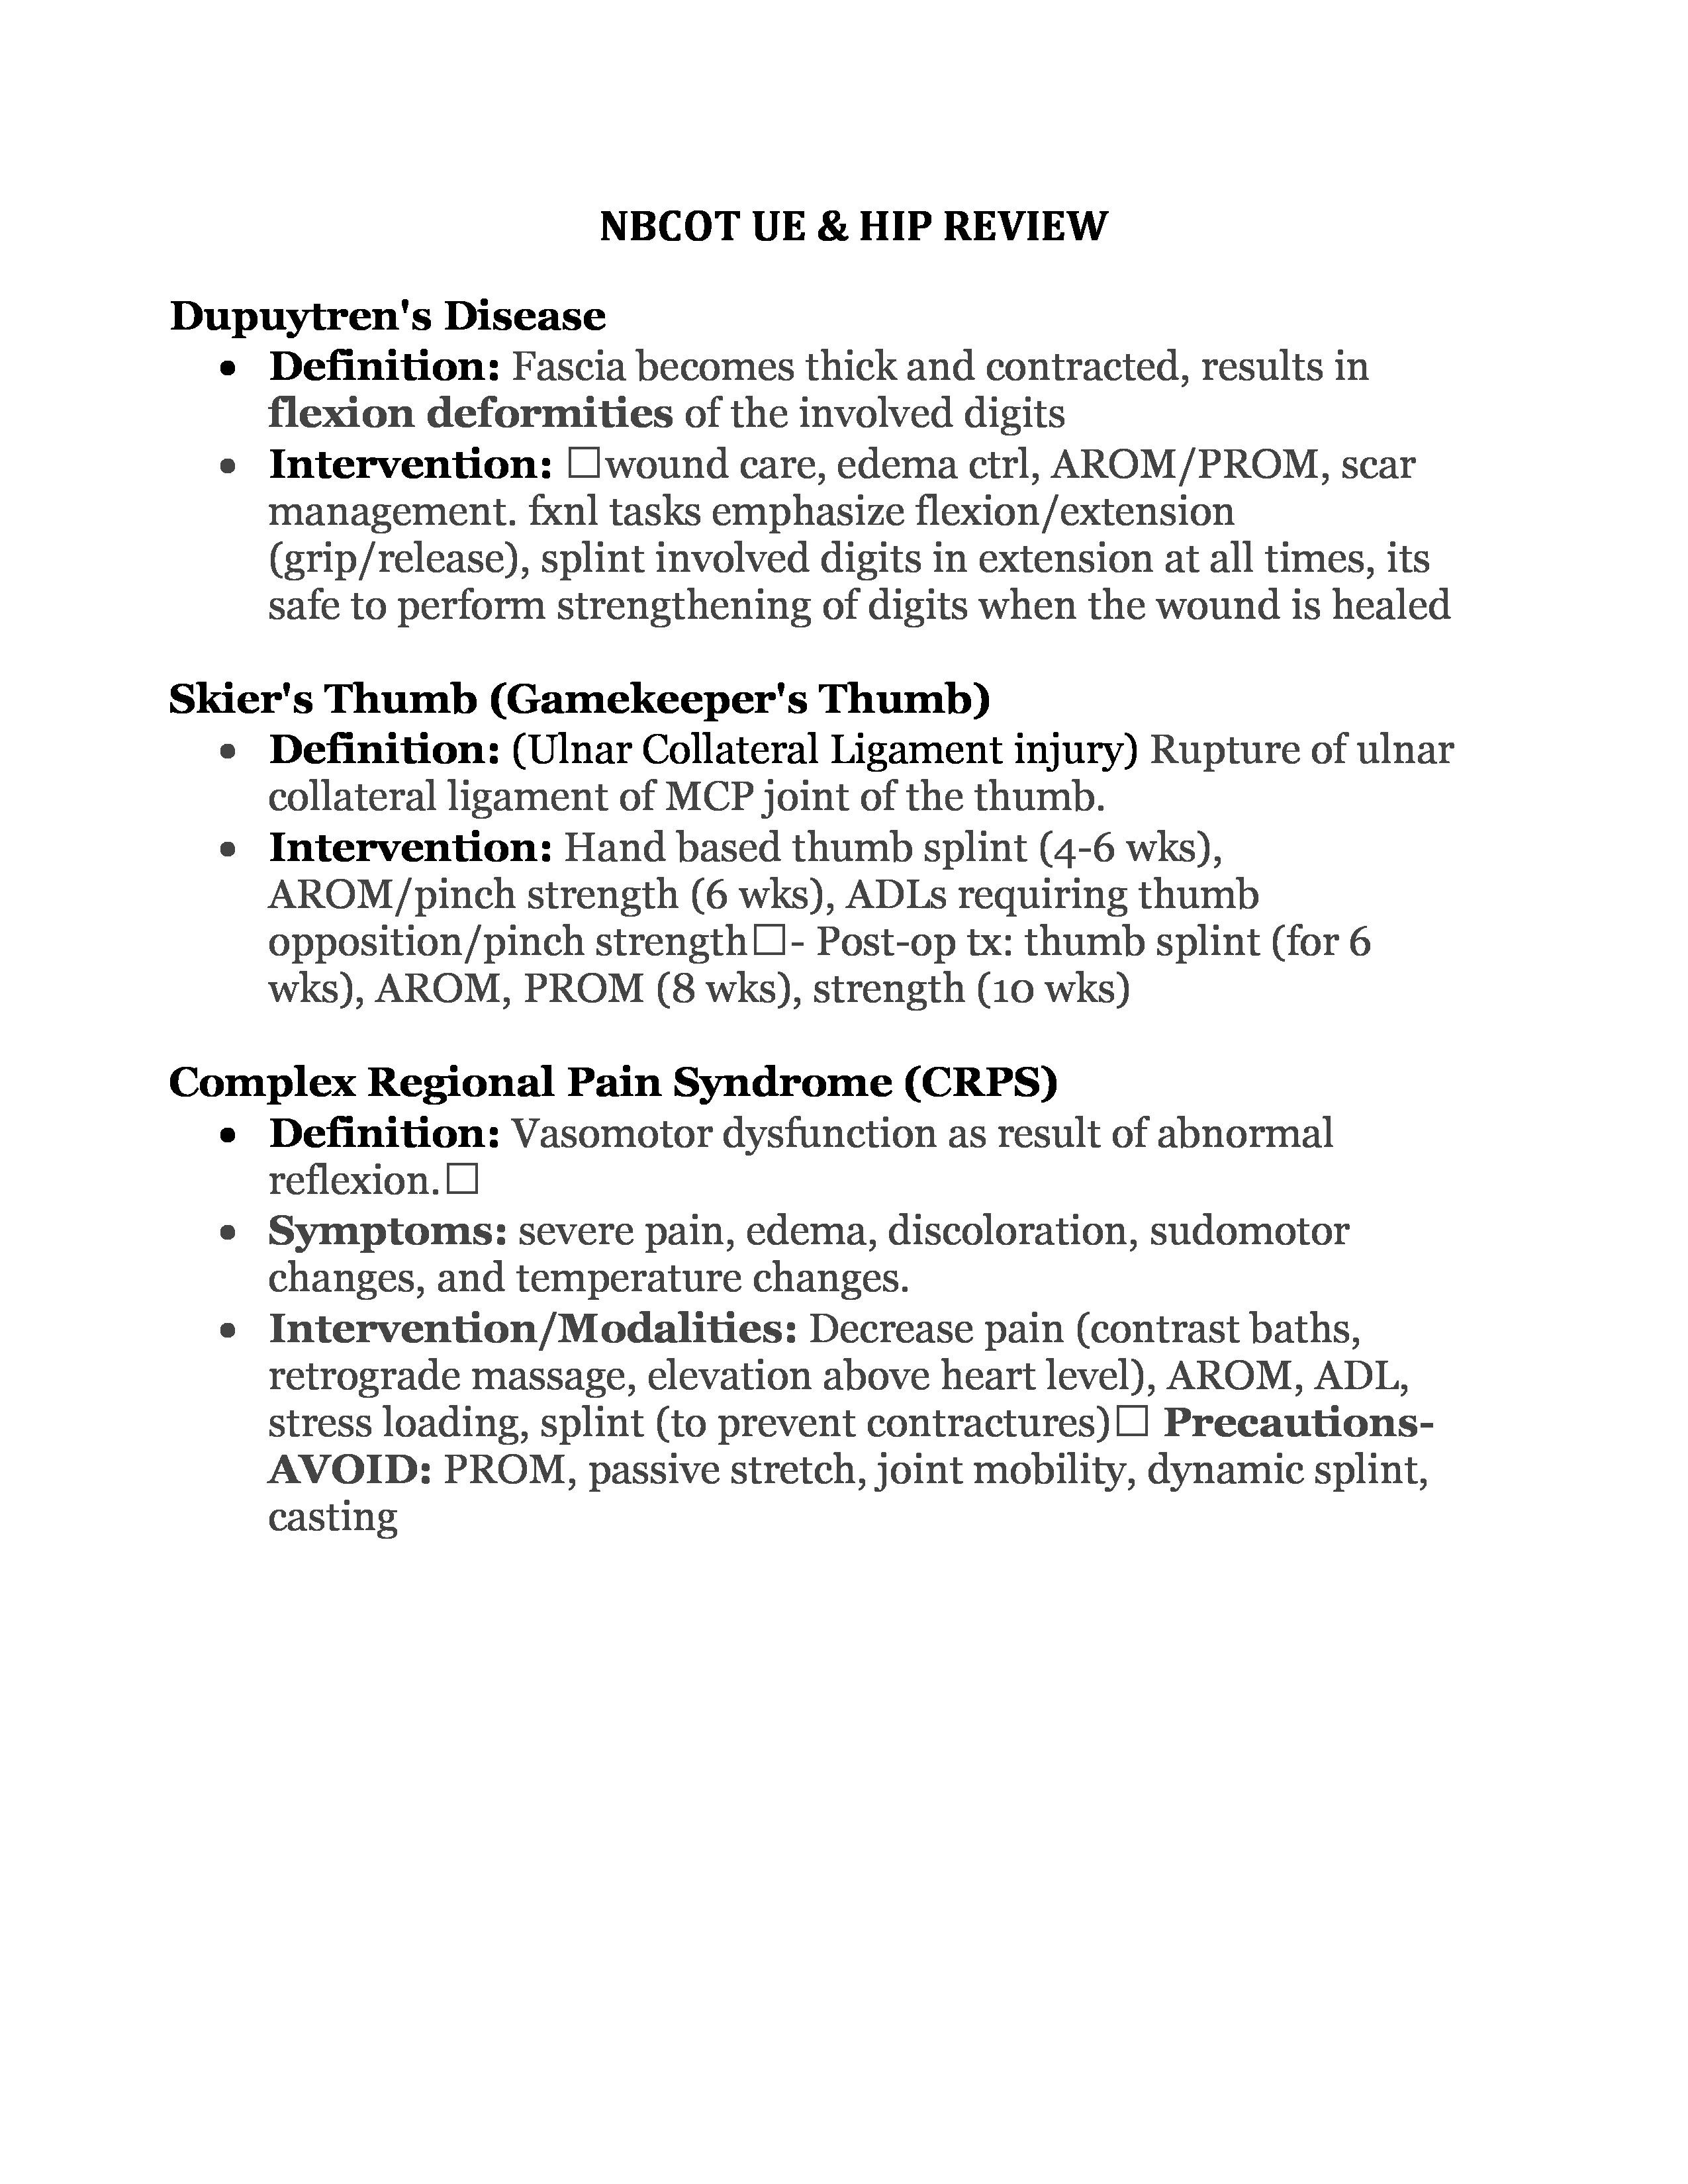 nbcot ue & hip review page 1 | nbcot exam prep | pinterest